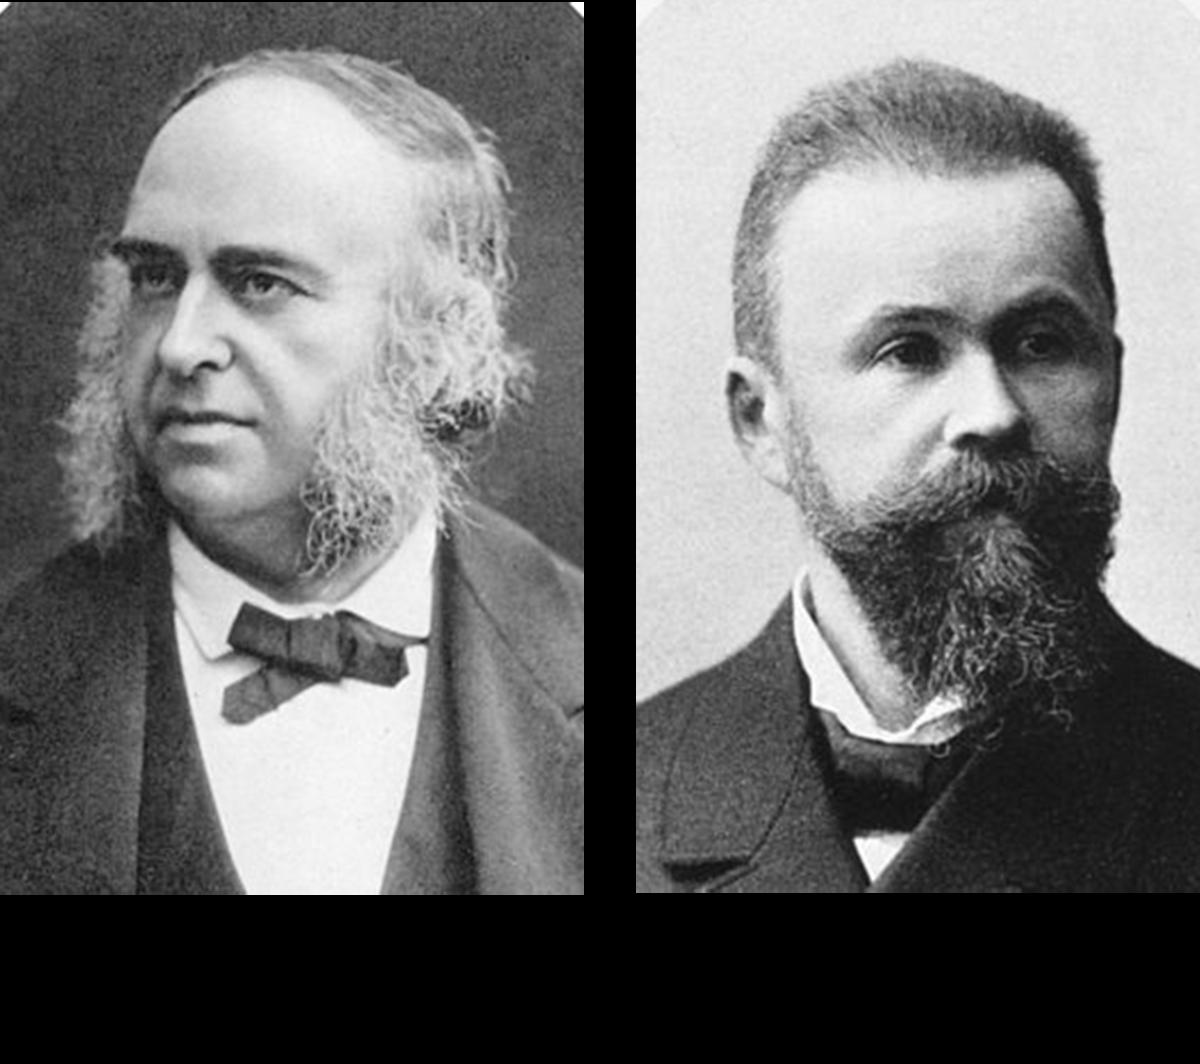 Portraits of Paul Broca and Carl Wernicke